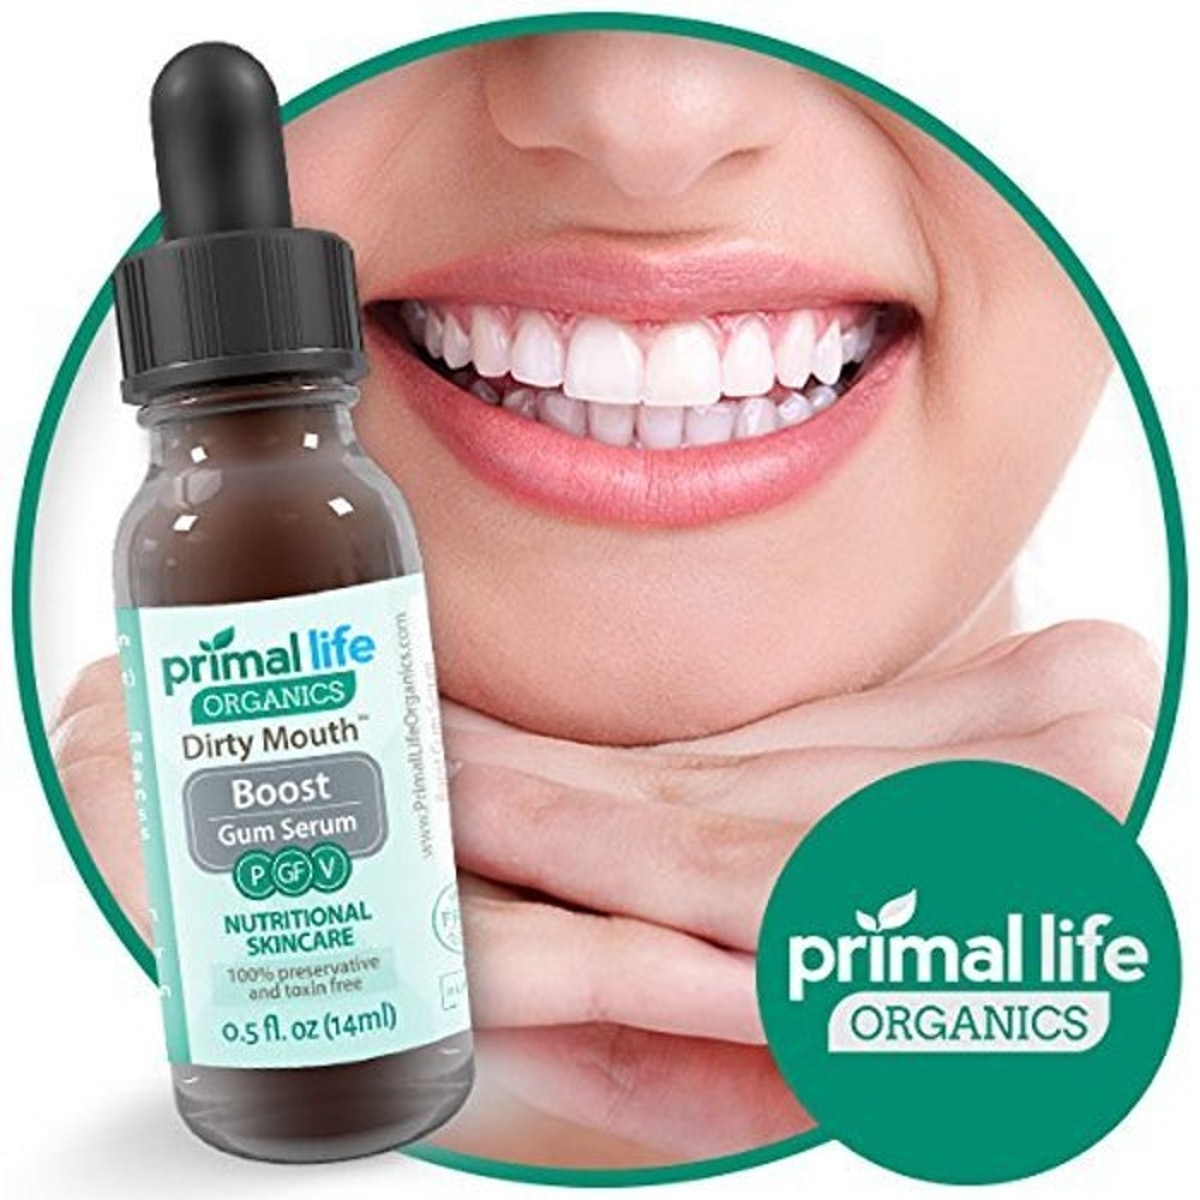 Primal Life Organics Natural Mouthwash Gum Serum